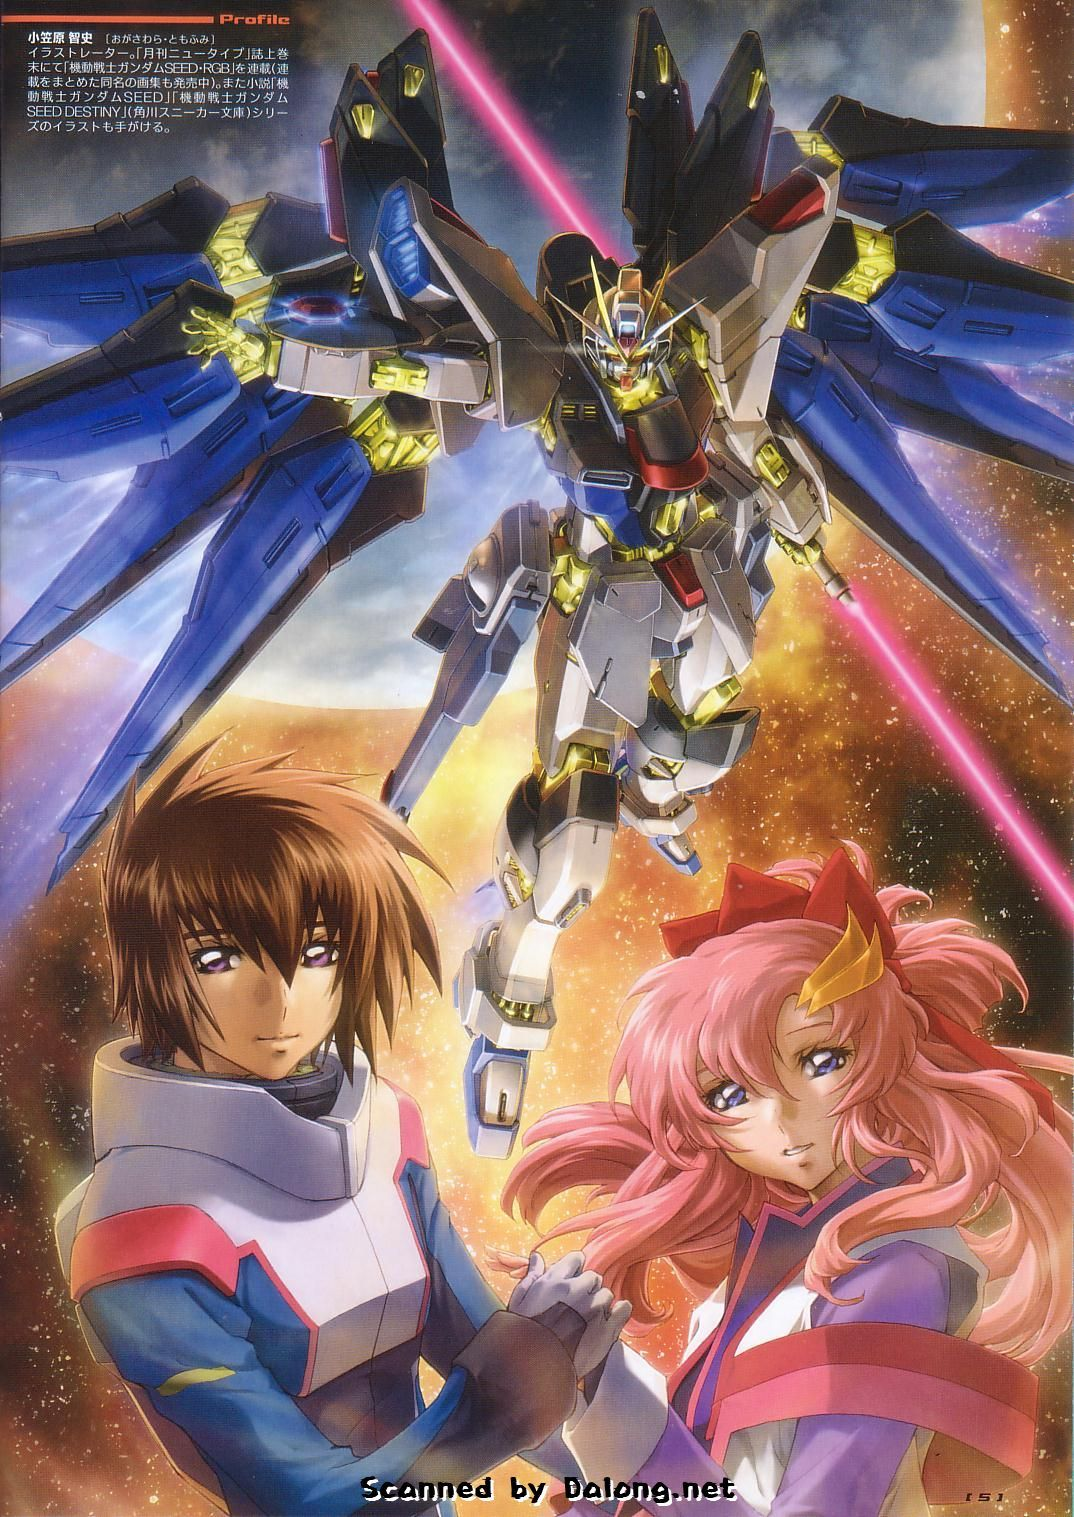 Kira And Lacus And Strike Freedom Anime ガンダム ガンダムseed